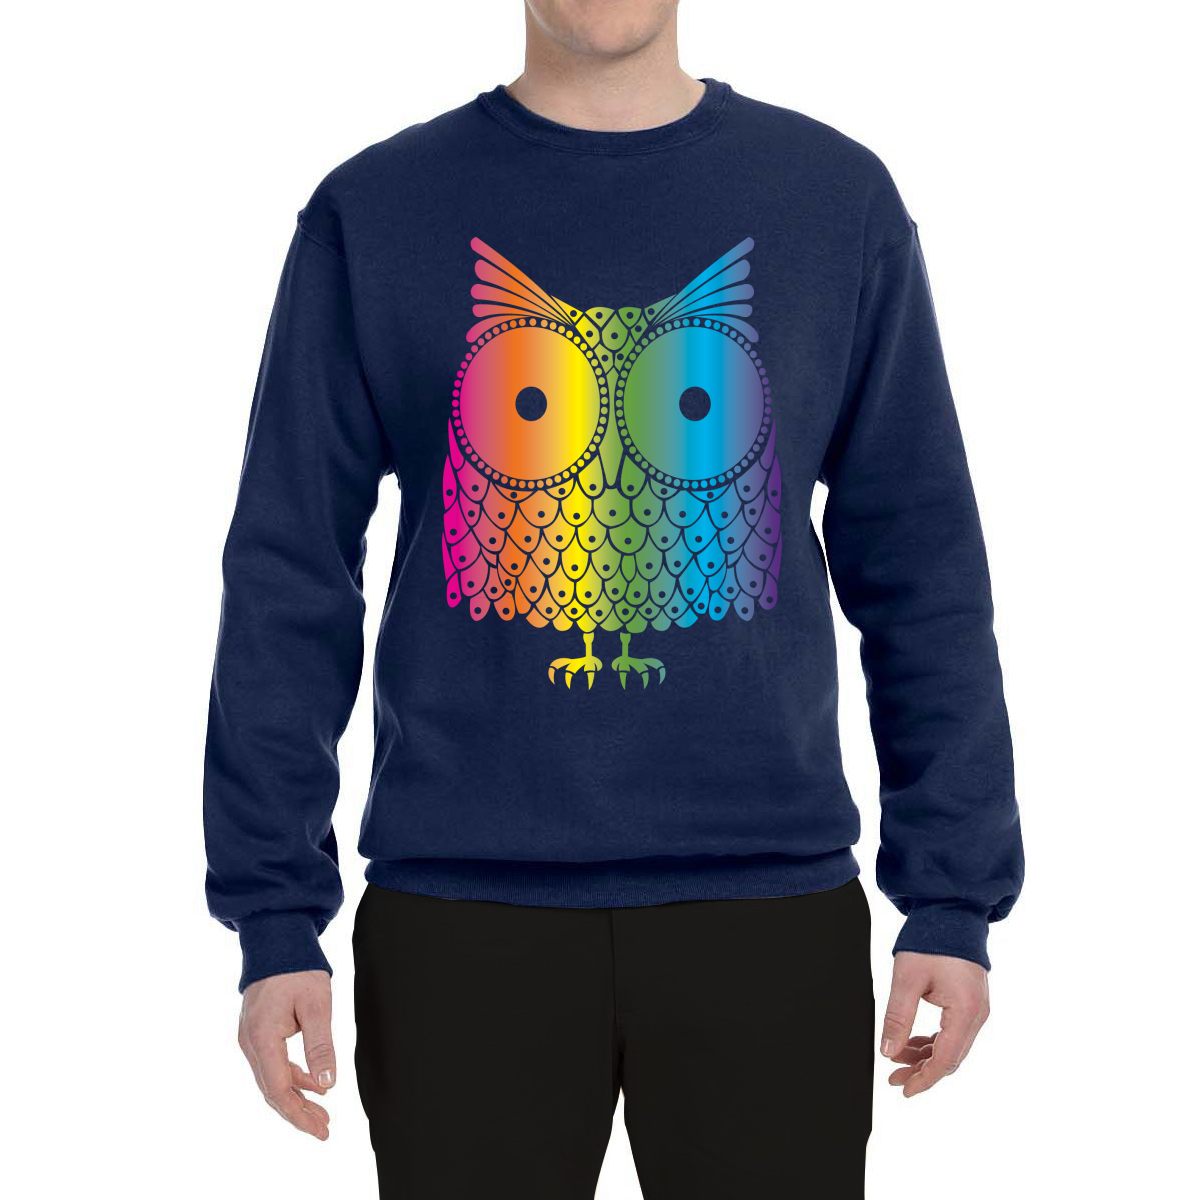 3a2d81db9ccc Colorful-Owl-Mens-Animal-Crewneck-Sweatshirt-Animals-Sweater thumbnail